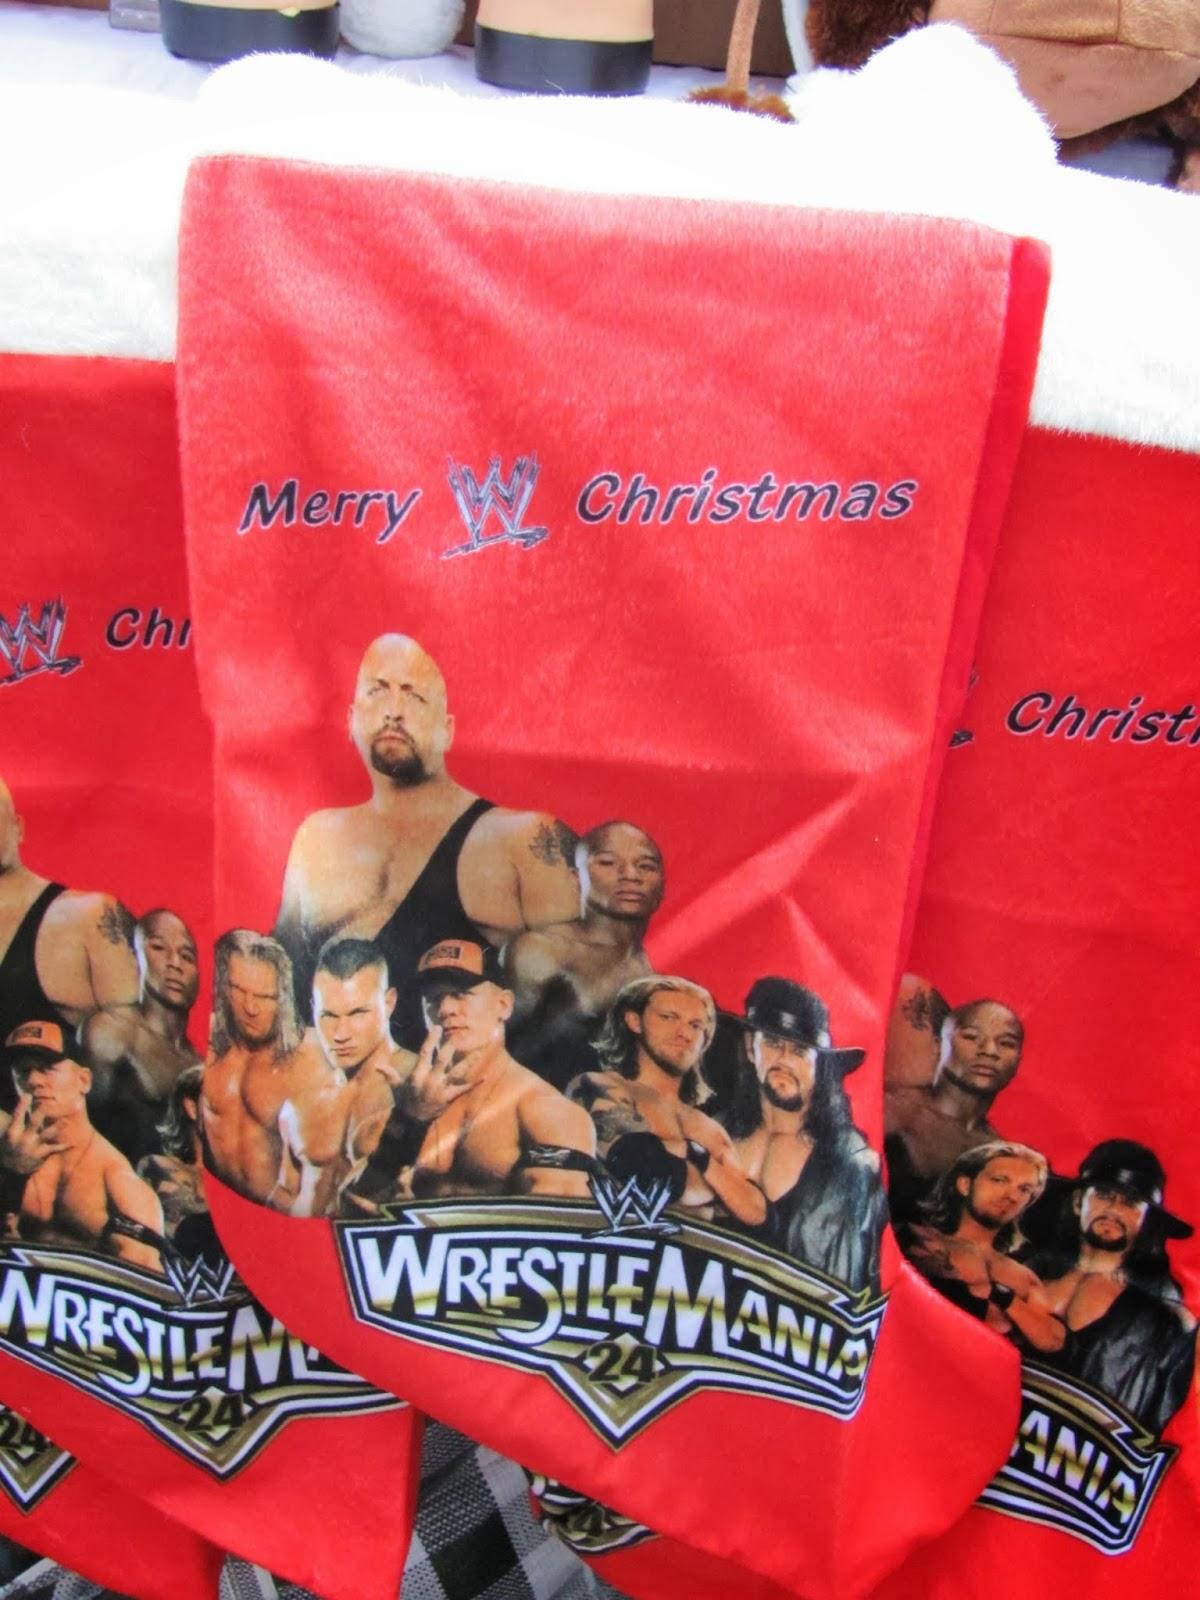 Merry WWE Christmas